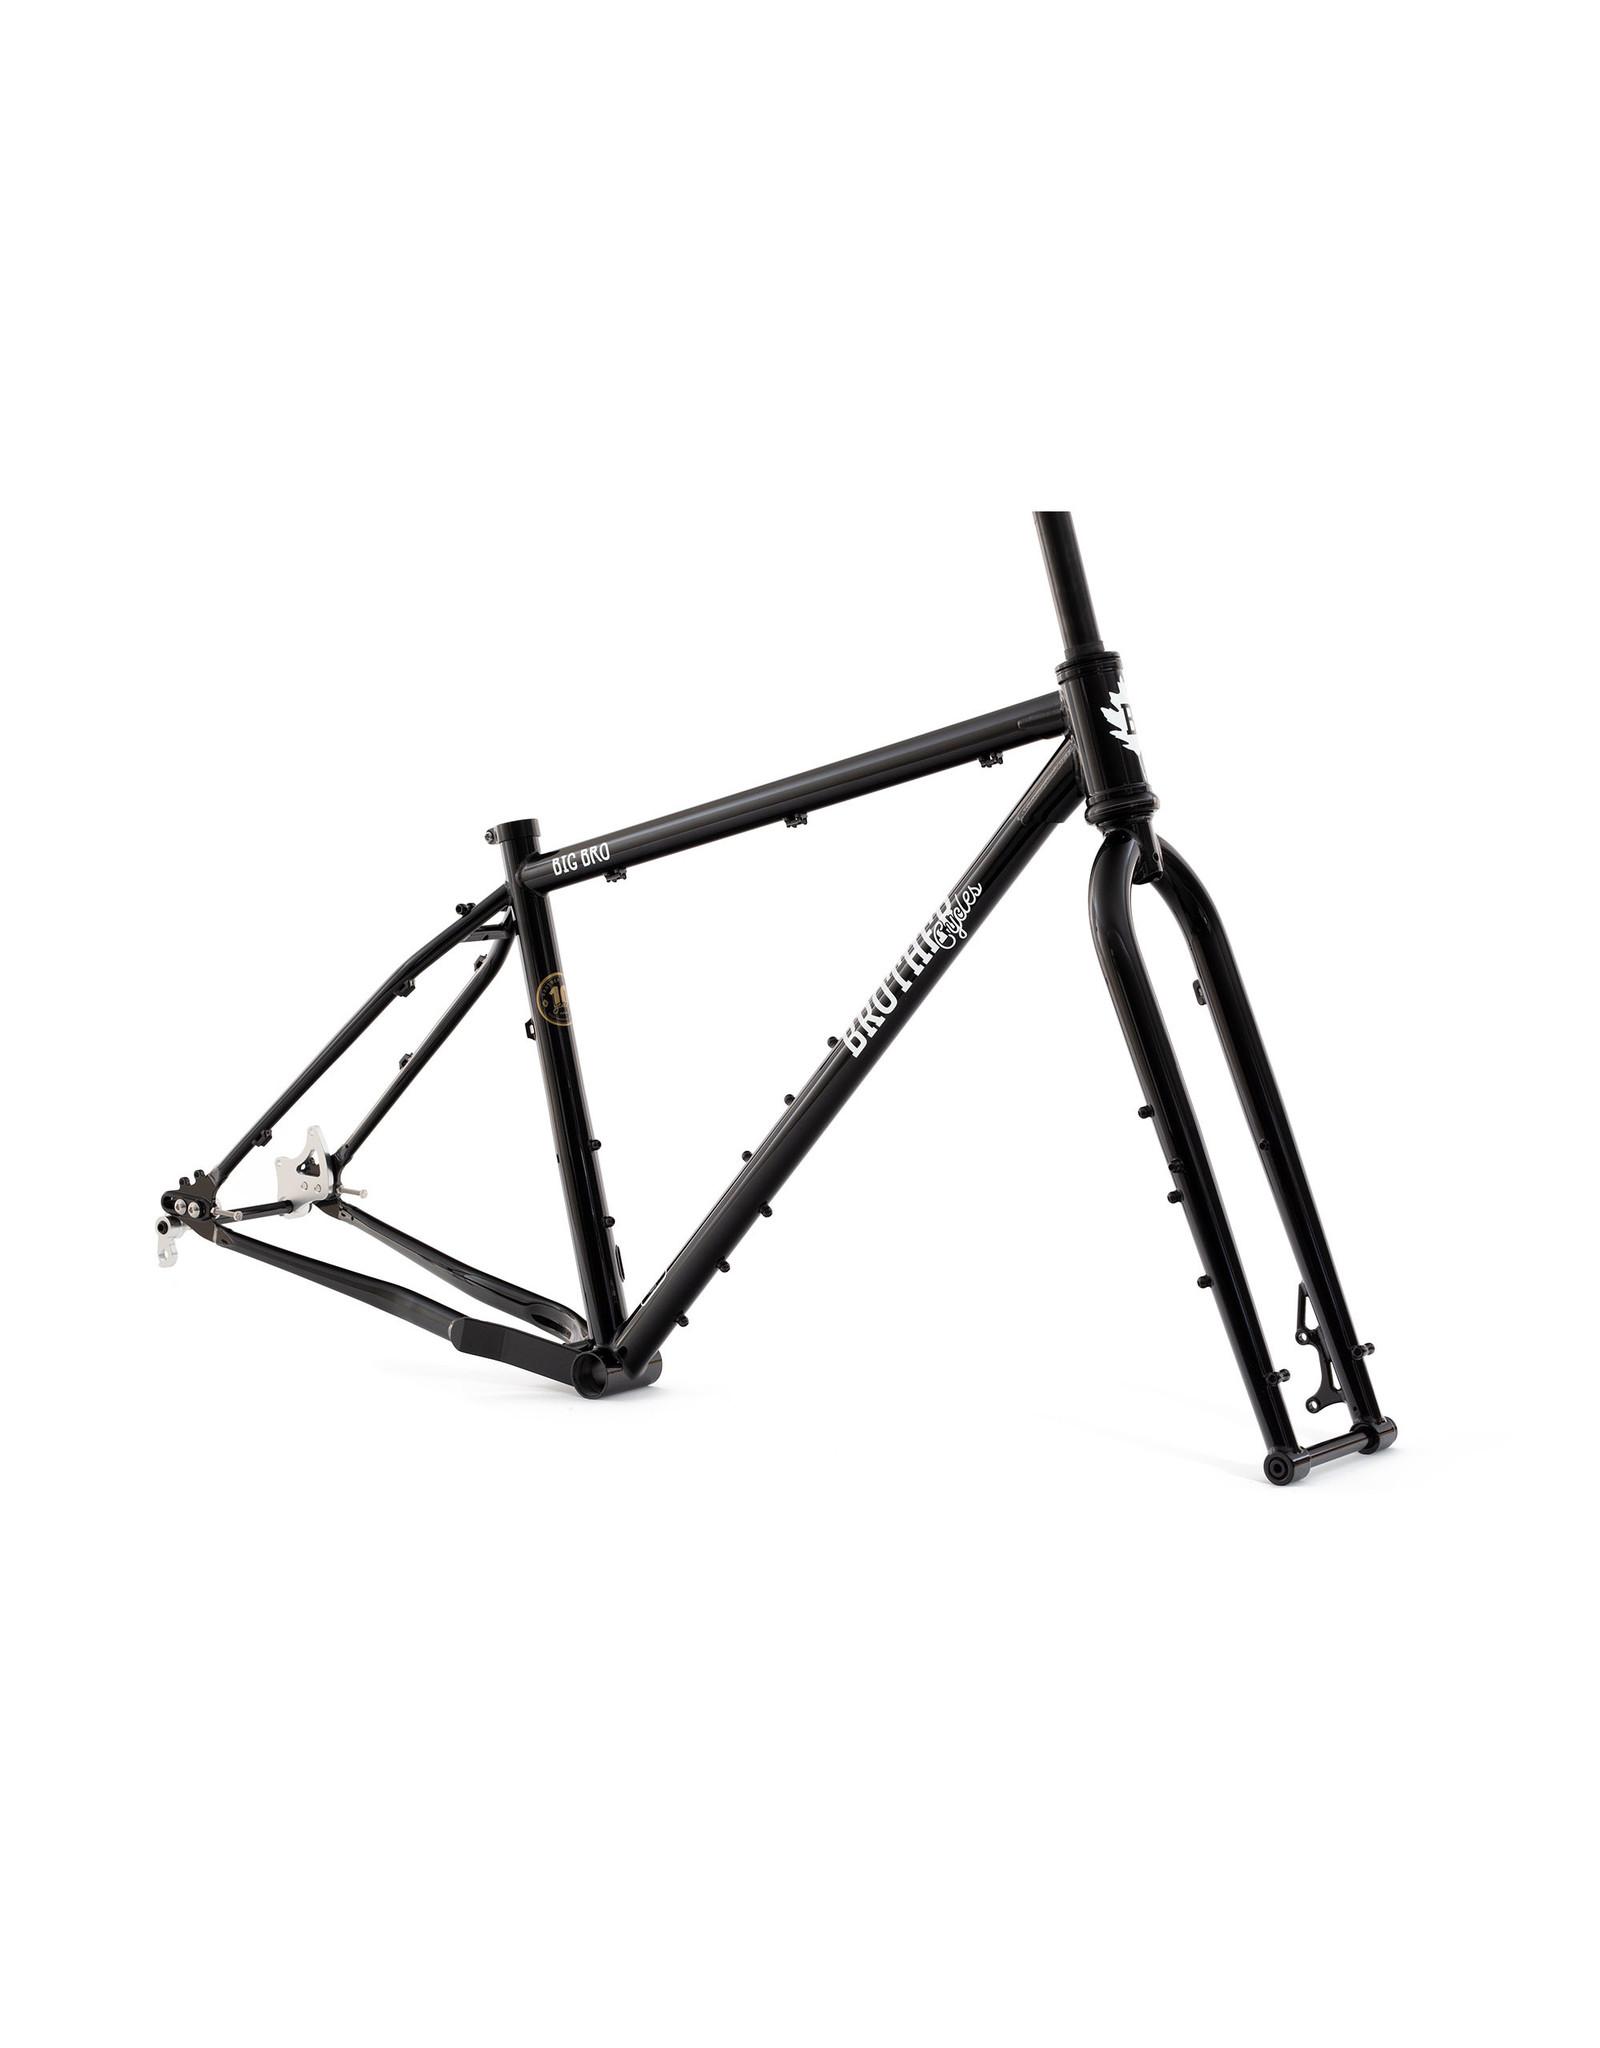 Brother Cycles - Big Bro 2020 Frameset - Black